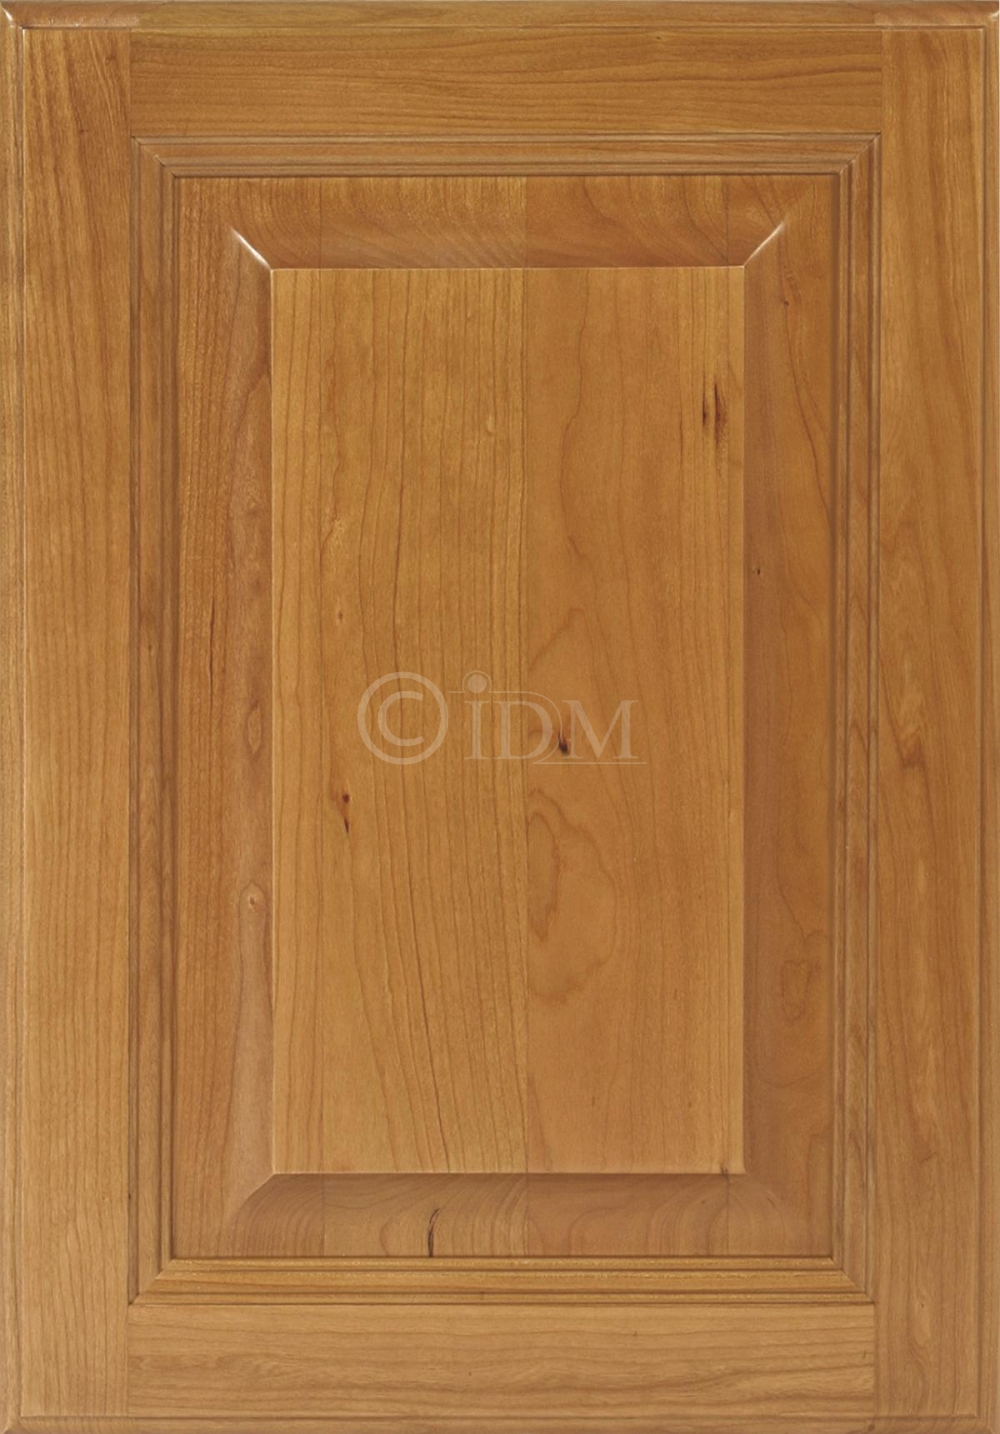 In Doors Manufacturing Ltd